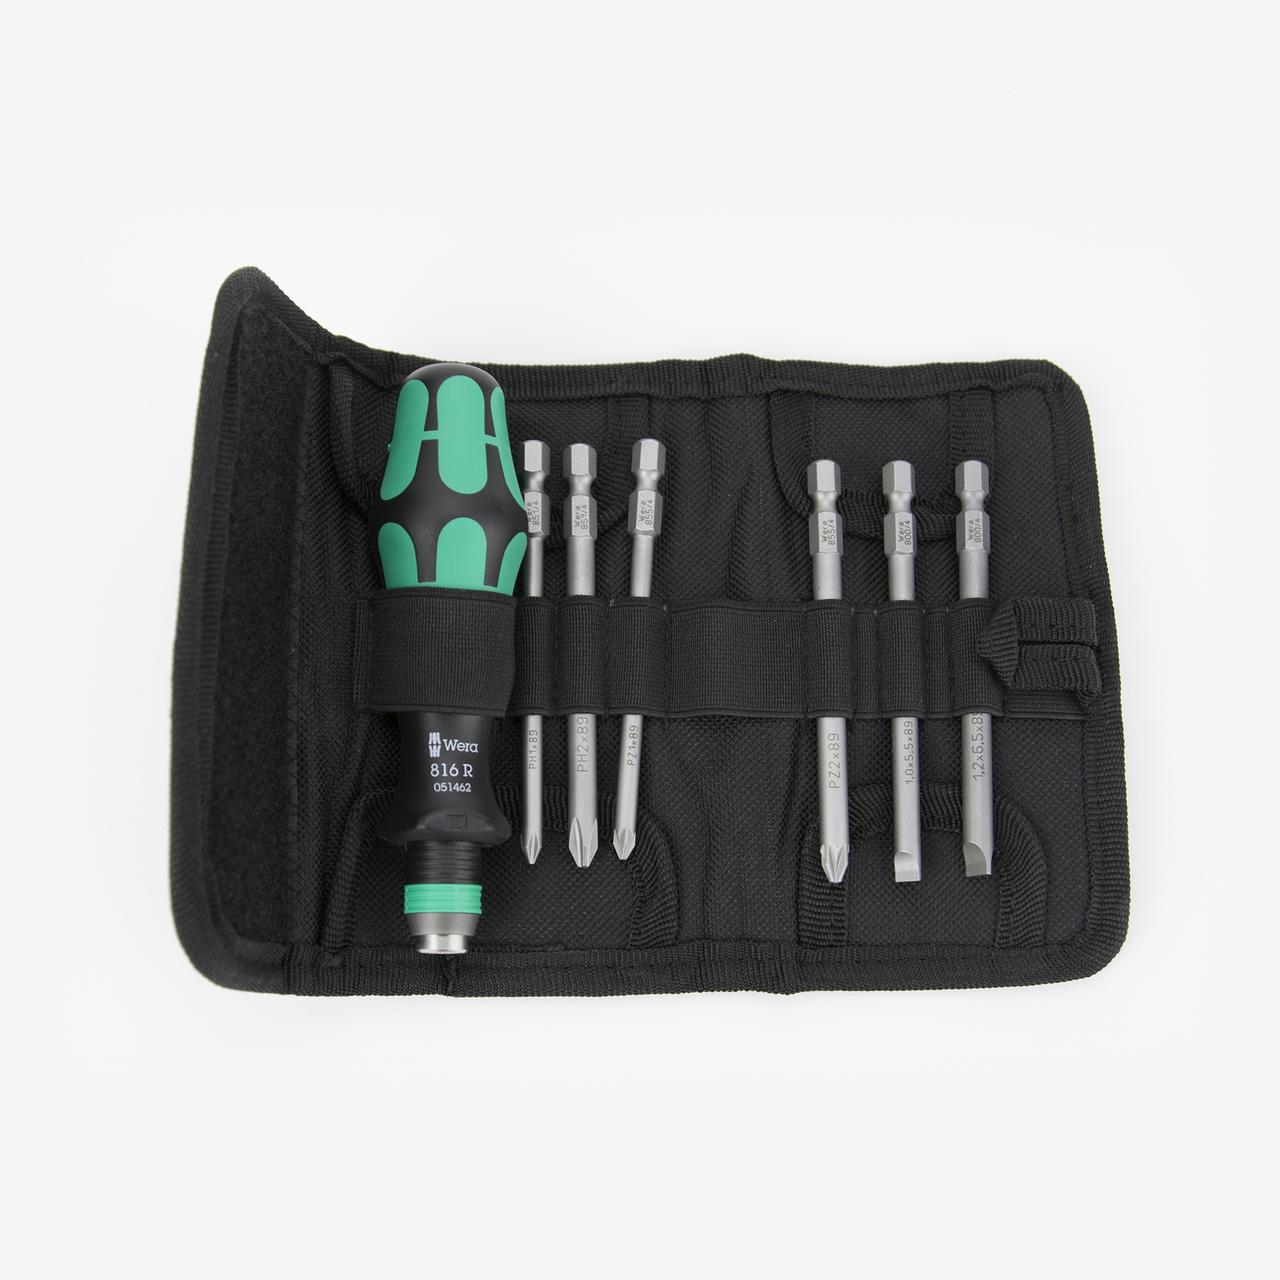 Wera 059298 Kraftform Kompakt 40 Pouch Set - KC Tool